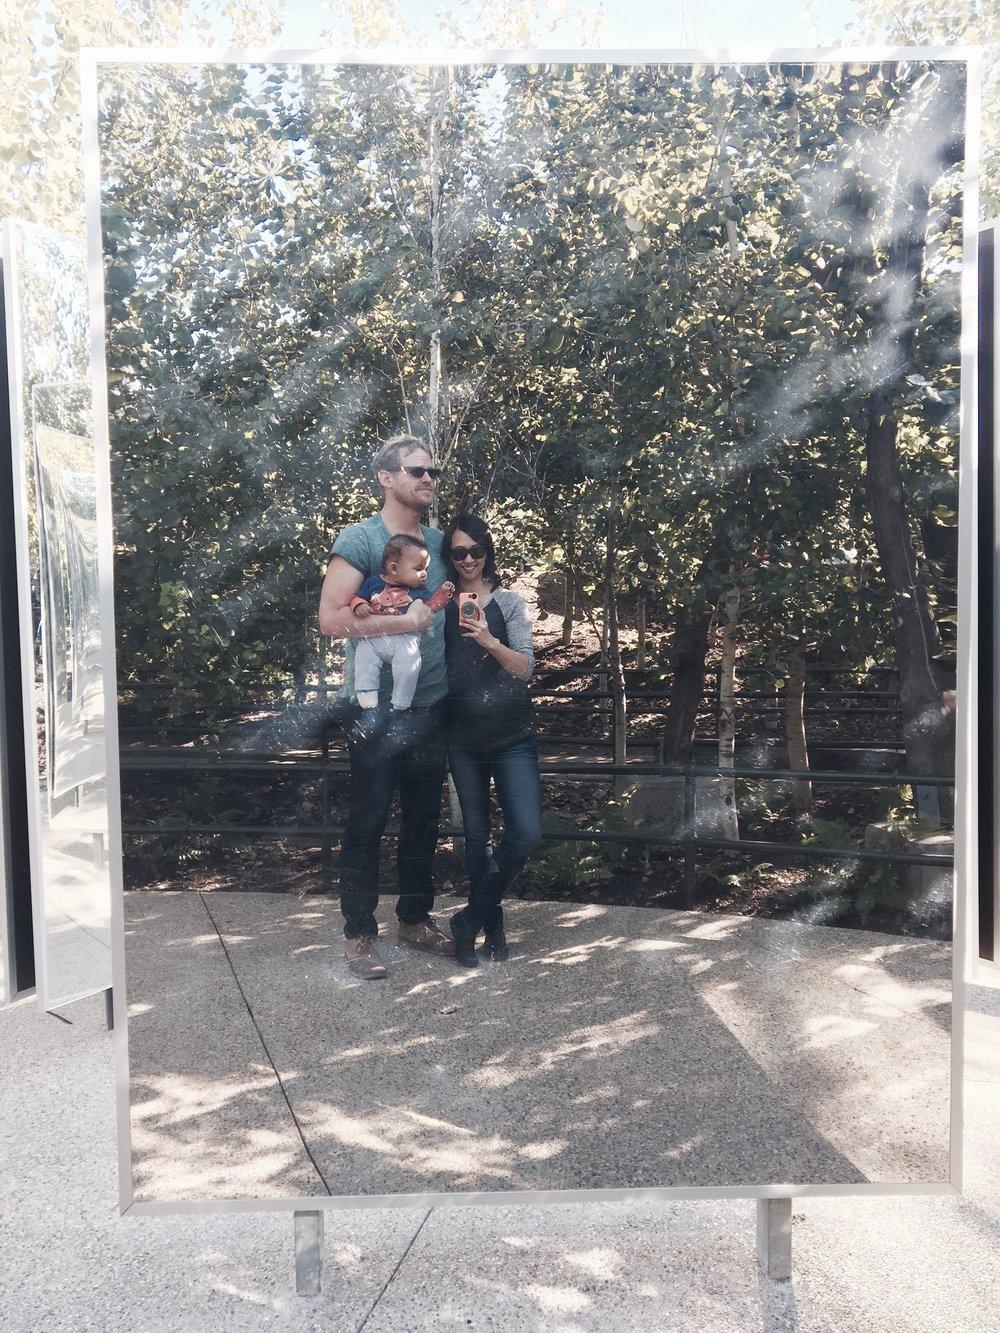 dtla-family-mirror.jpg